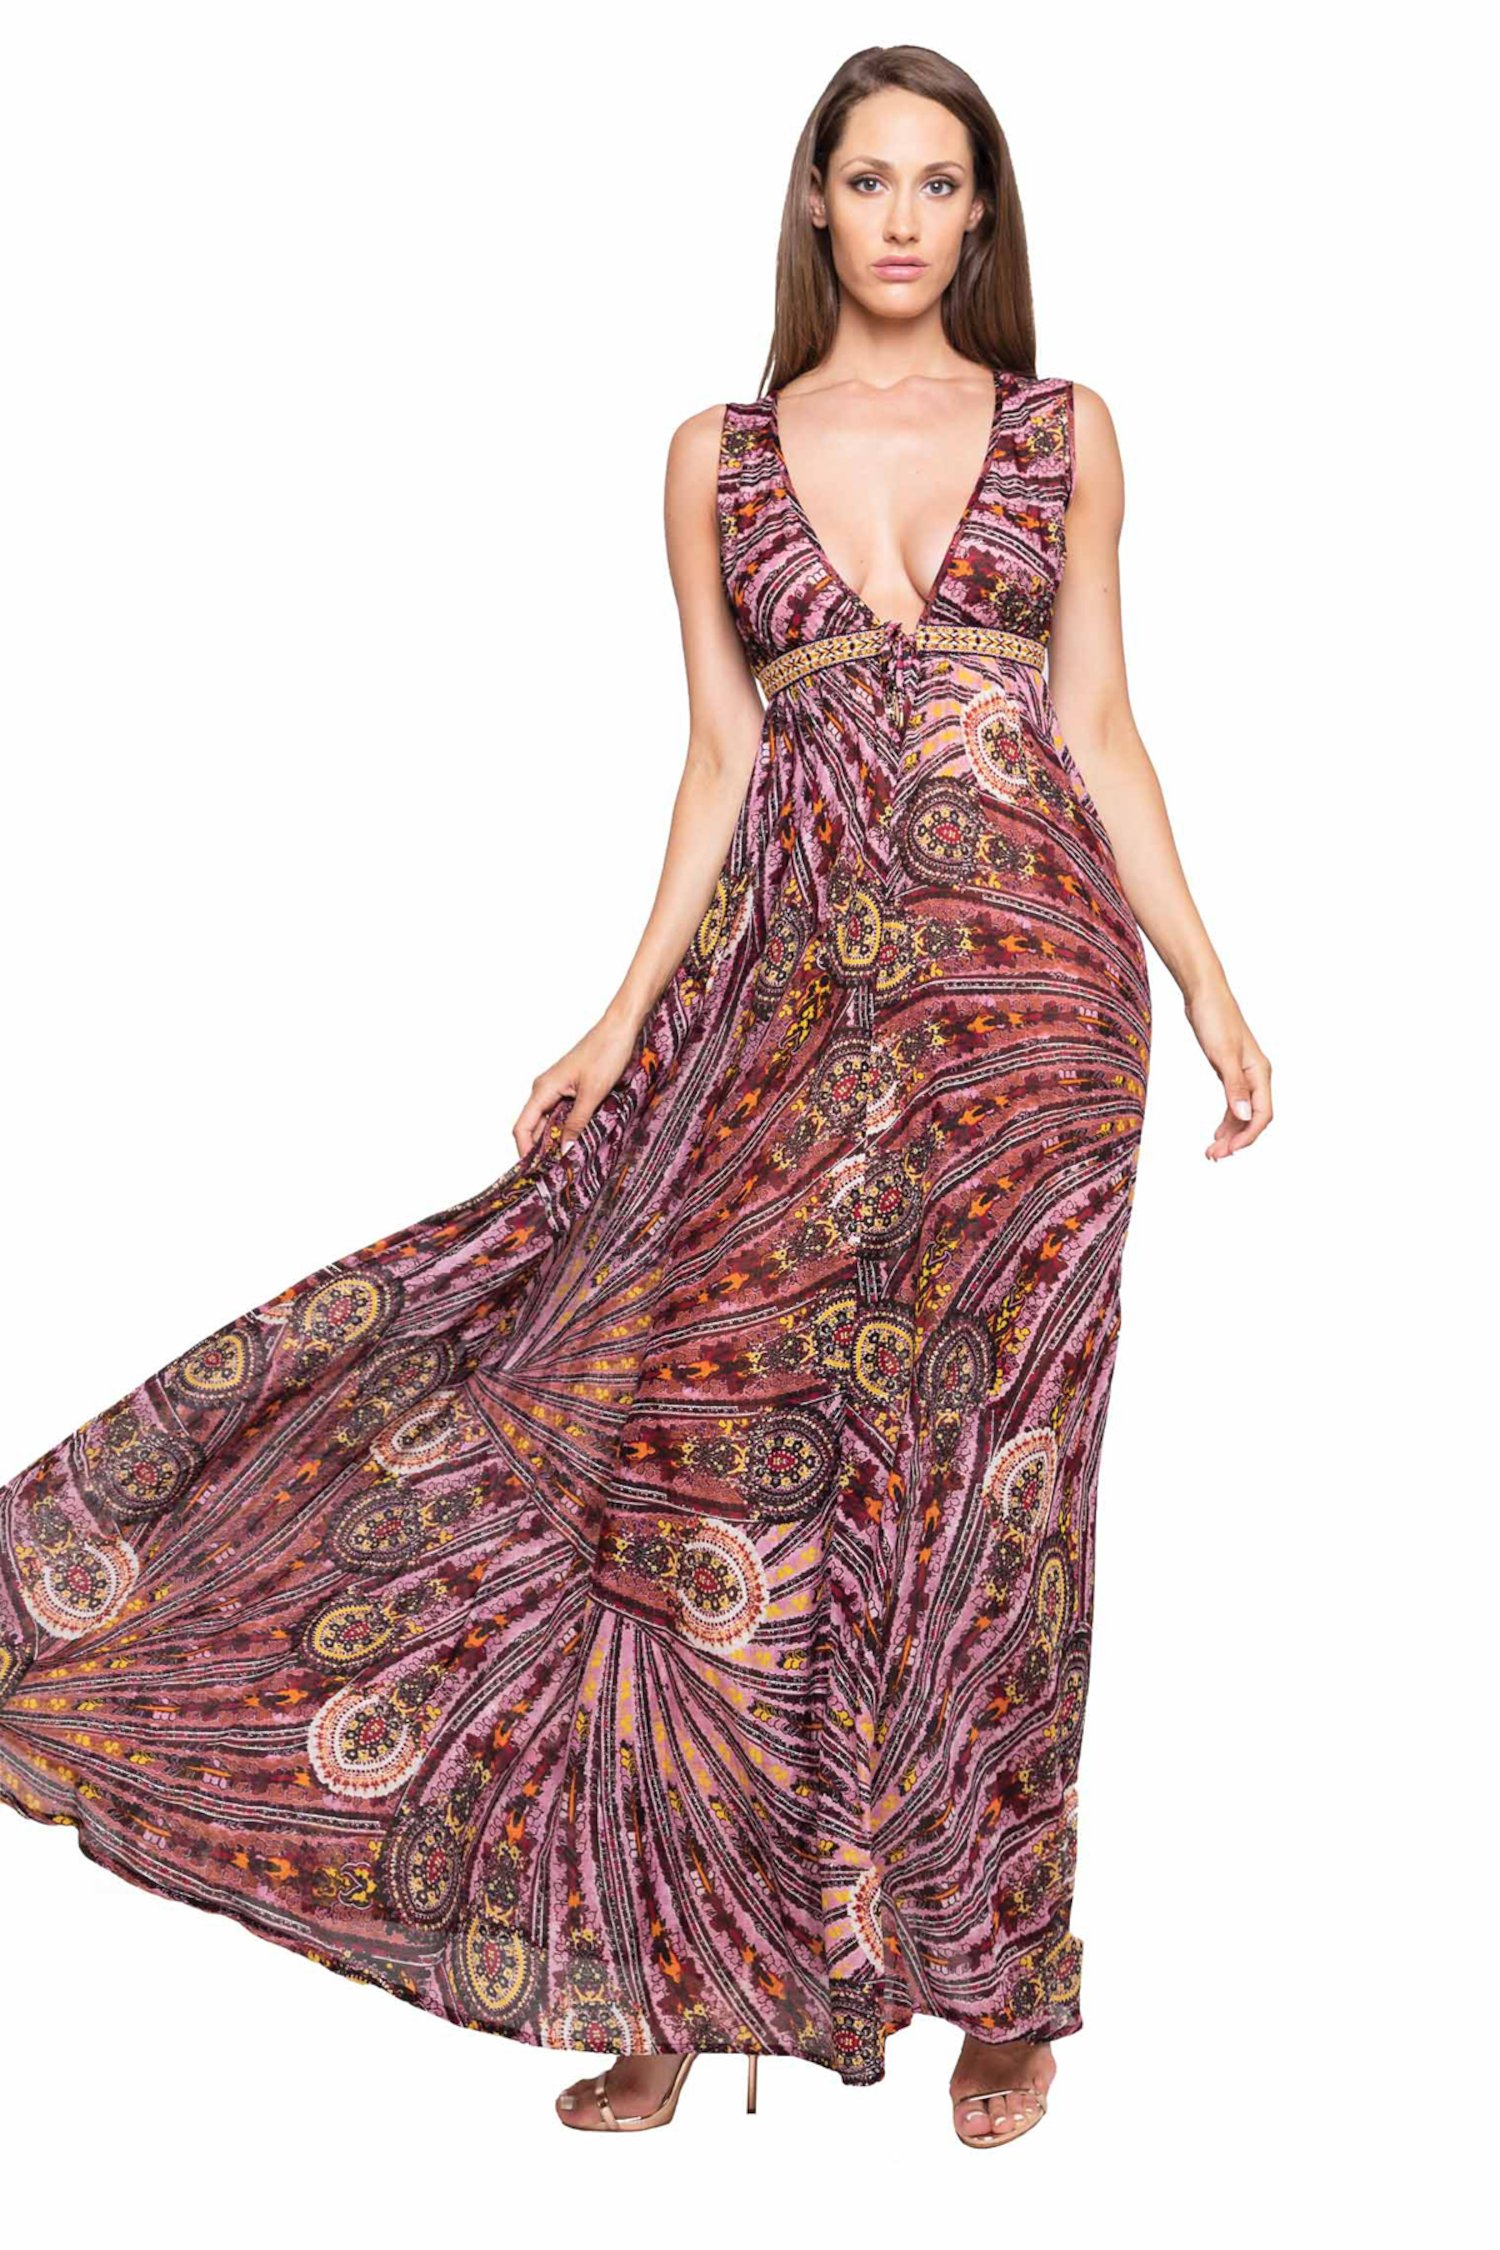 LONG DRESS EMPIRE EMBROIDERY THREAD - Cachemire Rosa